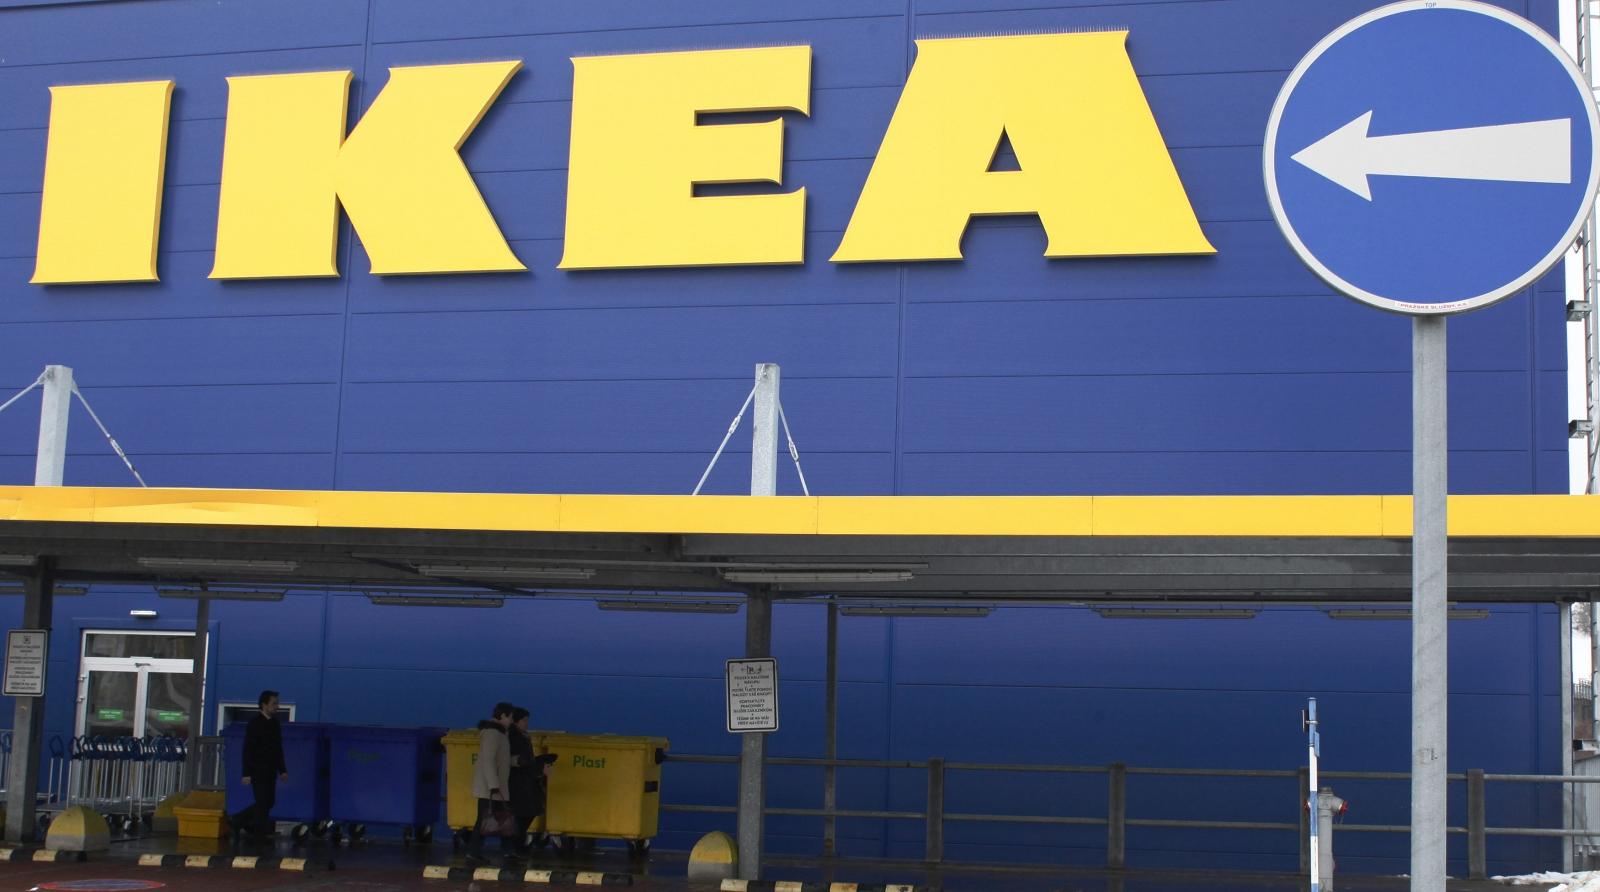 Swedish furniture store Ikea